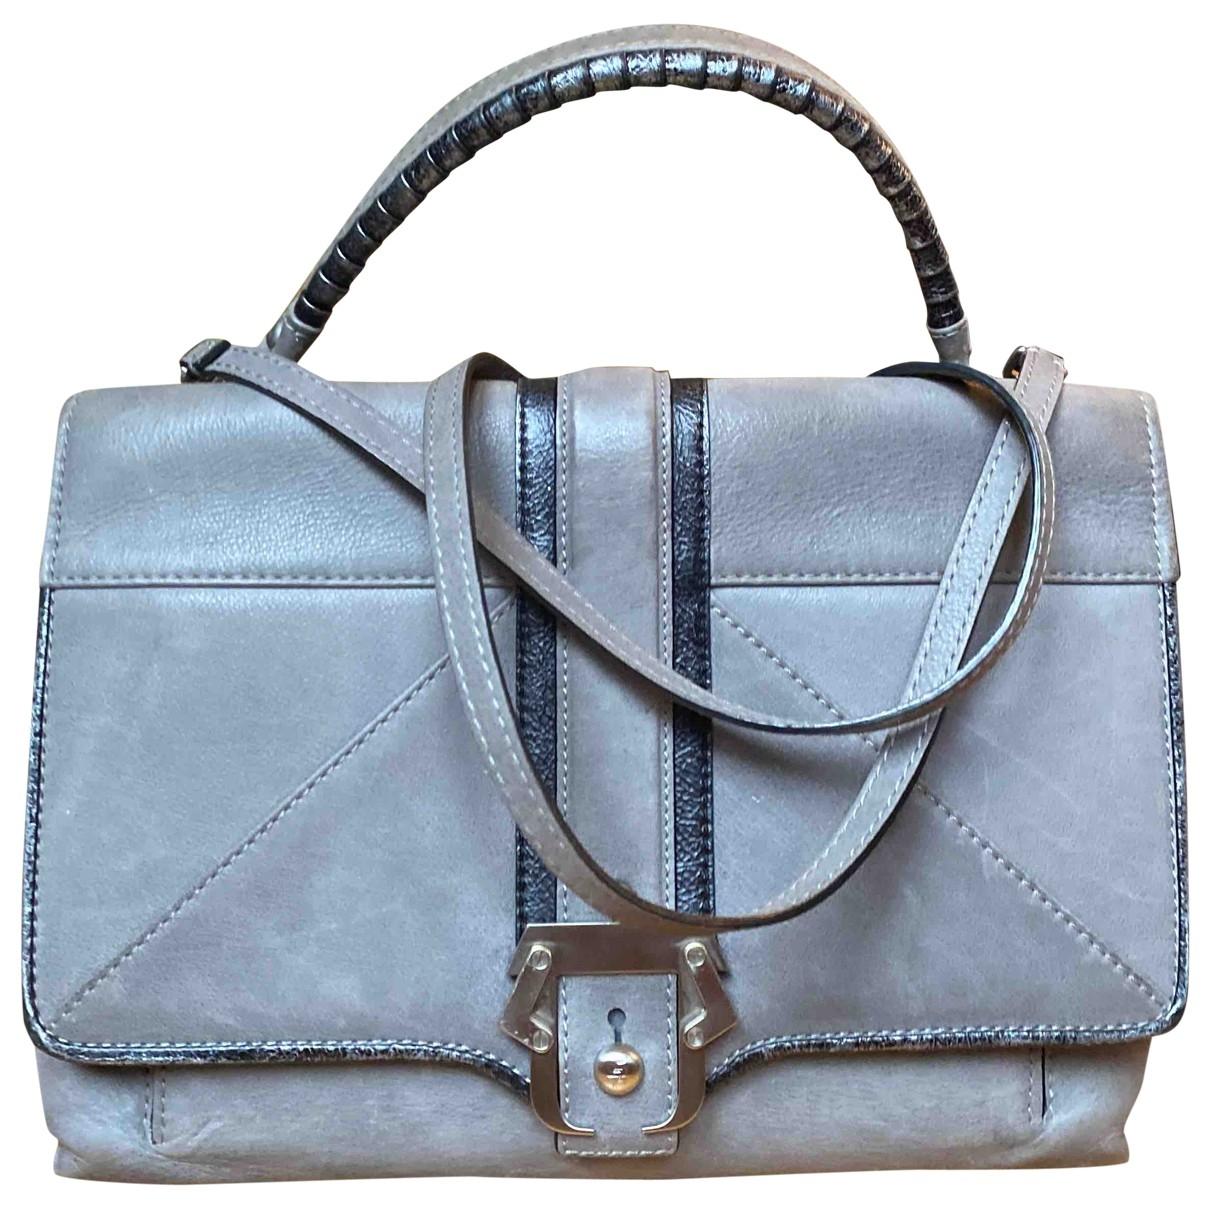 Paula Cademartori \N Handtasche in  Grau Veloursleder